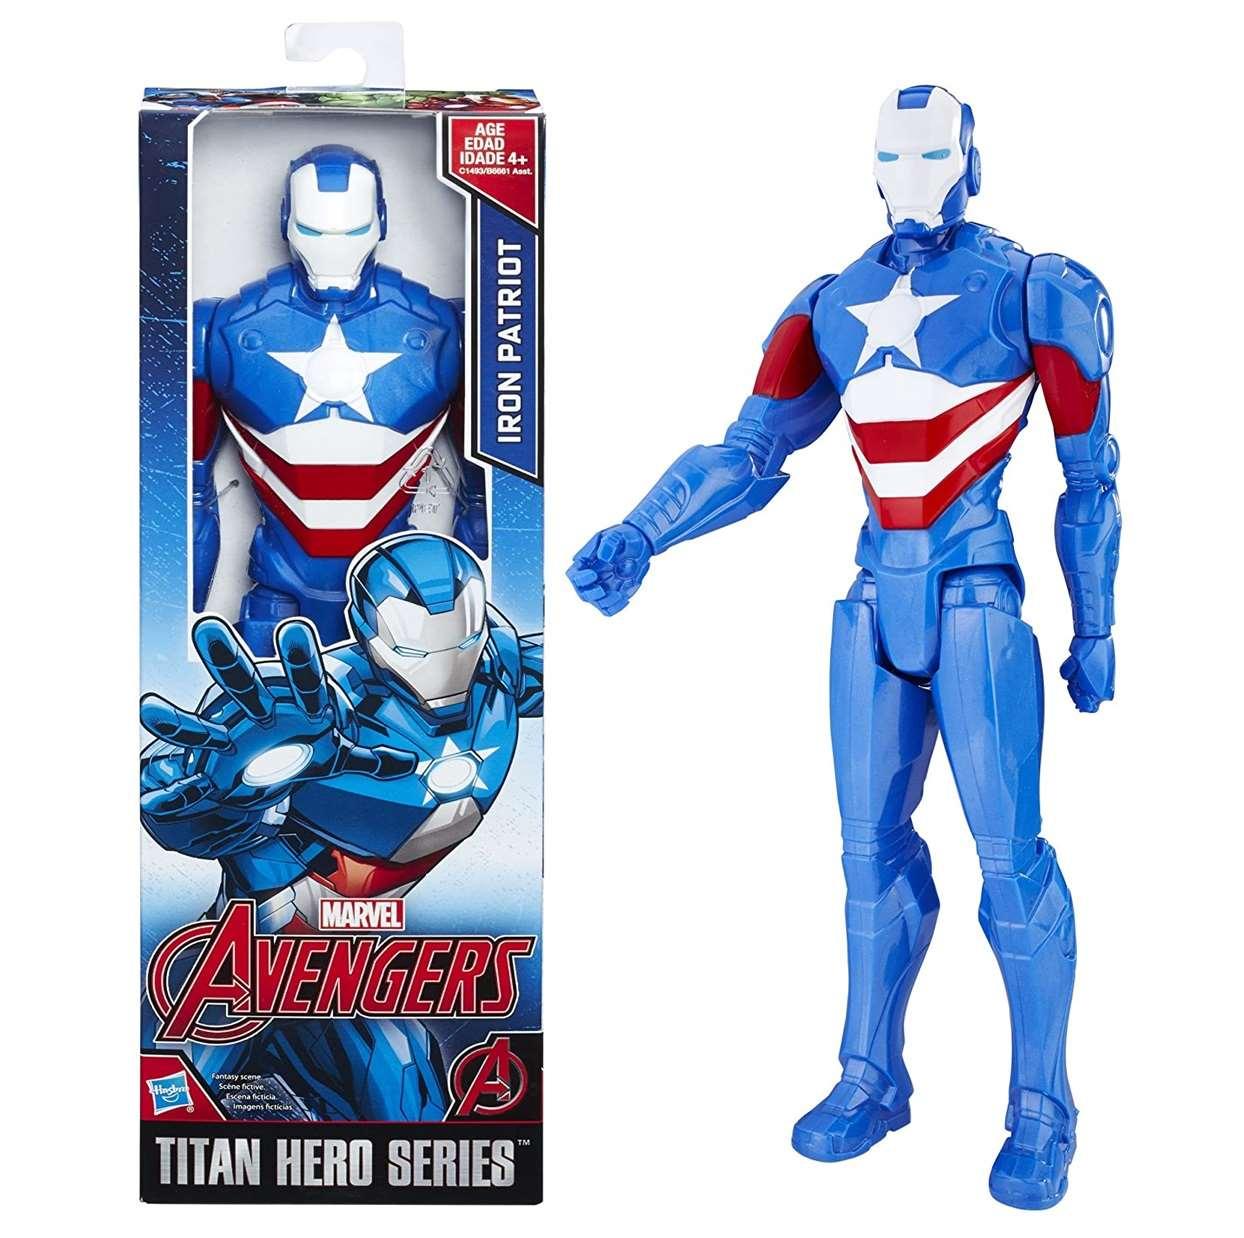 Iron Patriot Figura Avengers Titan Hero Series 12 Pulgadas